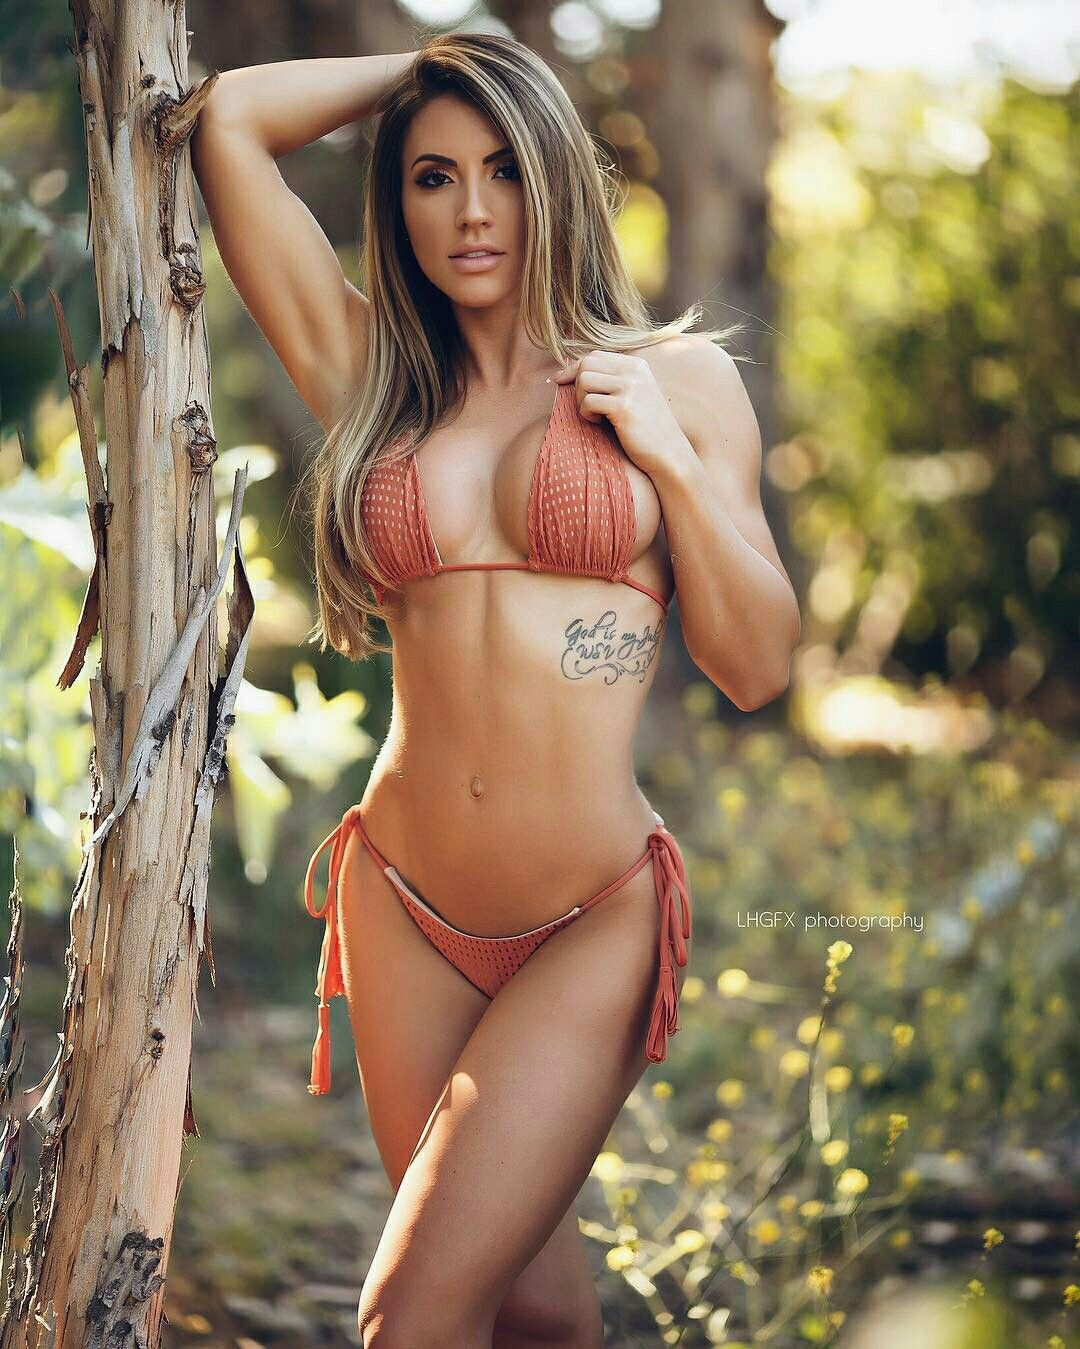 Young Bikini Danielle Vaughan  nudes (35 pics), Snapchat, butt